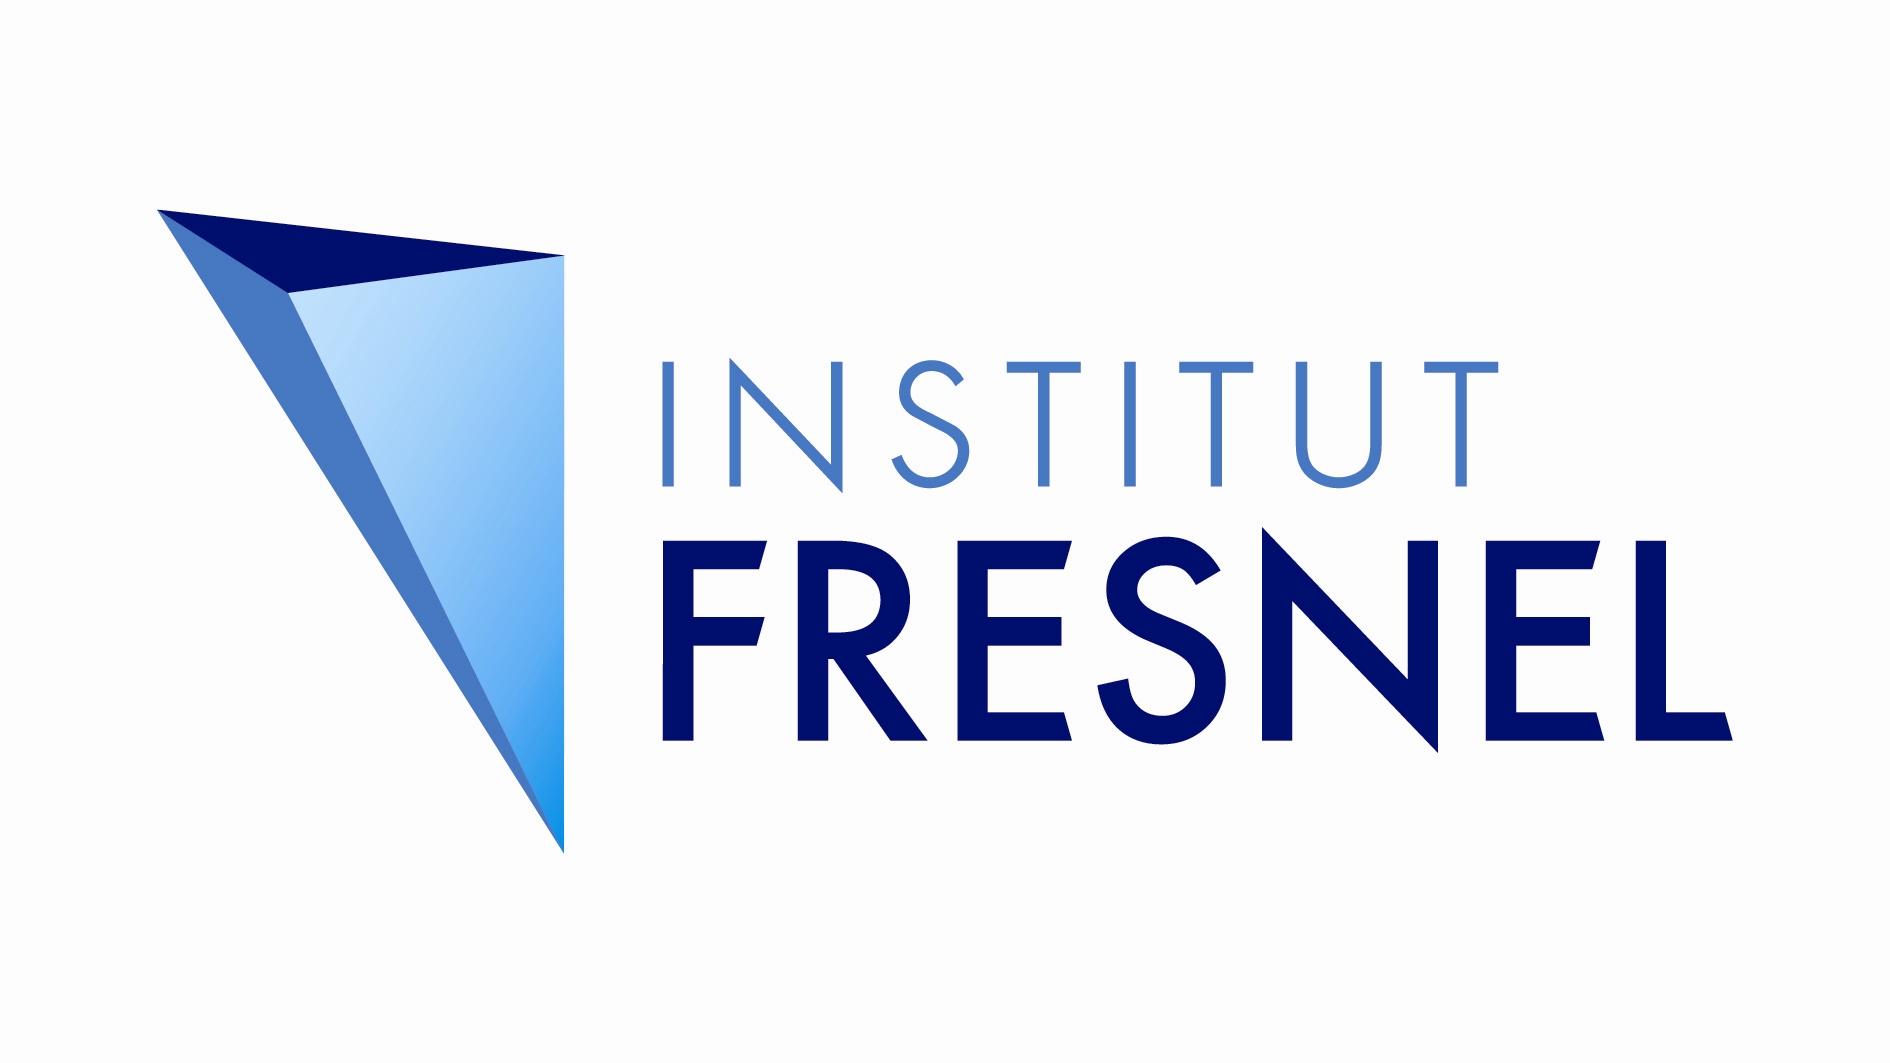 Logo institut fresnel